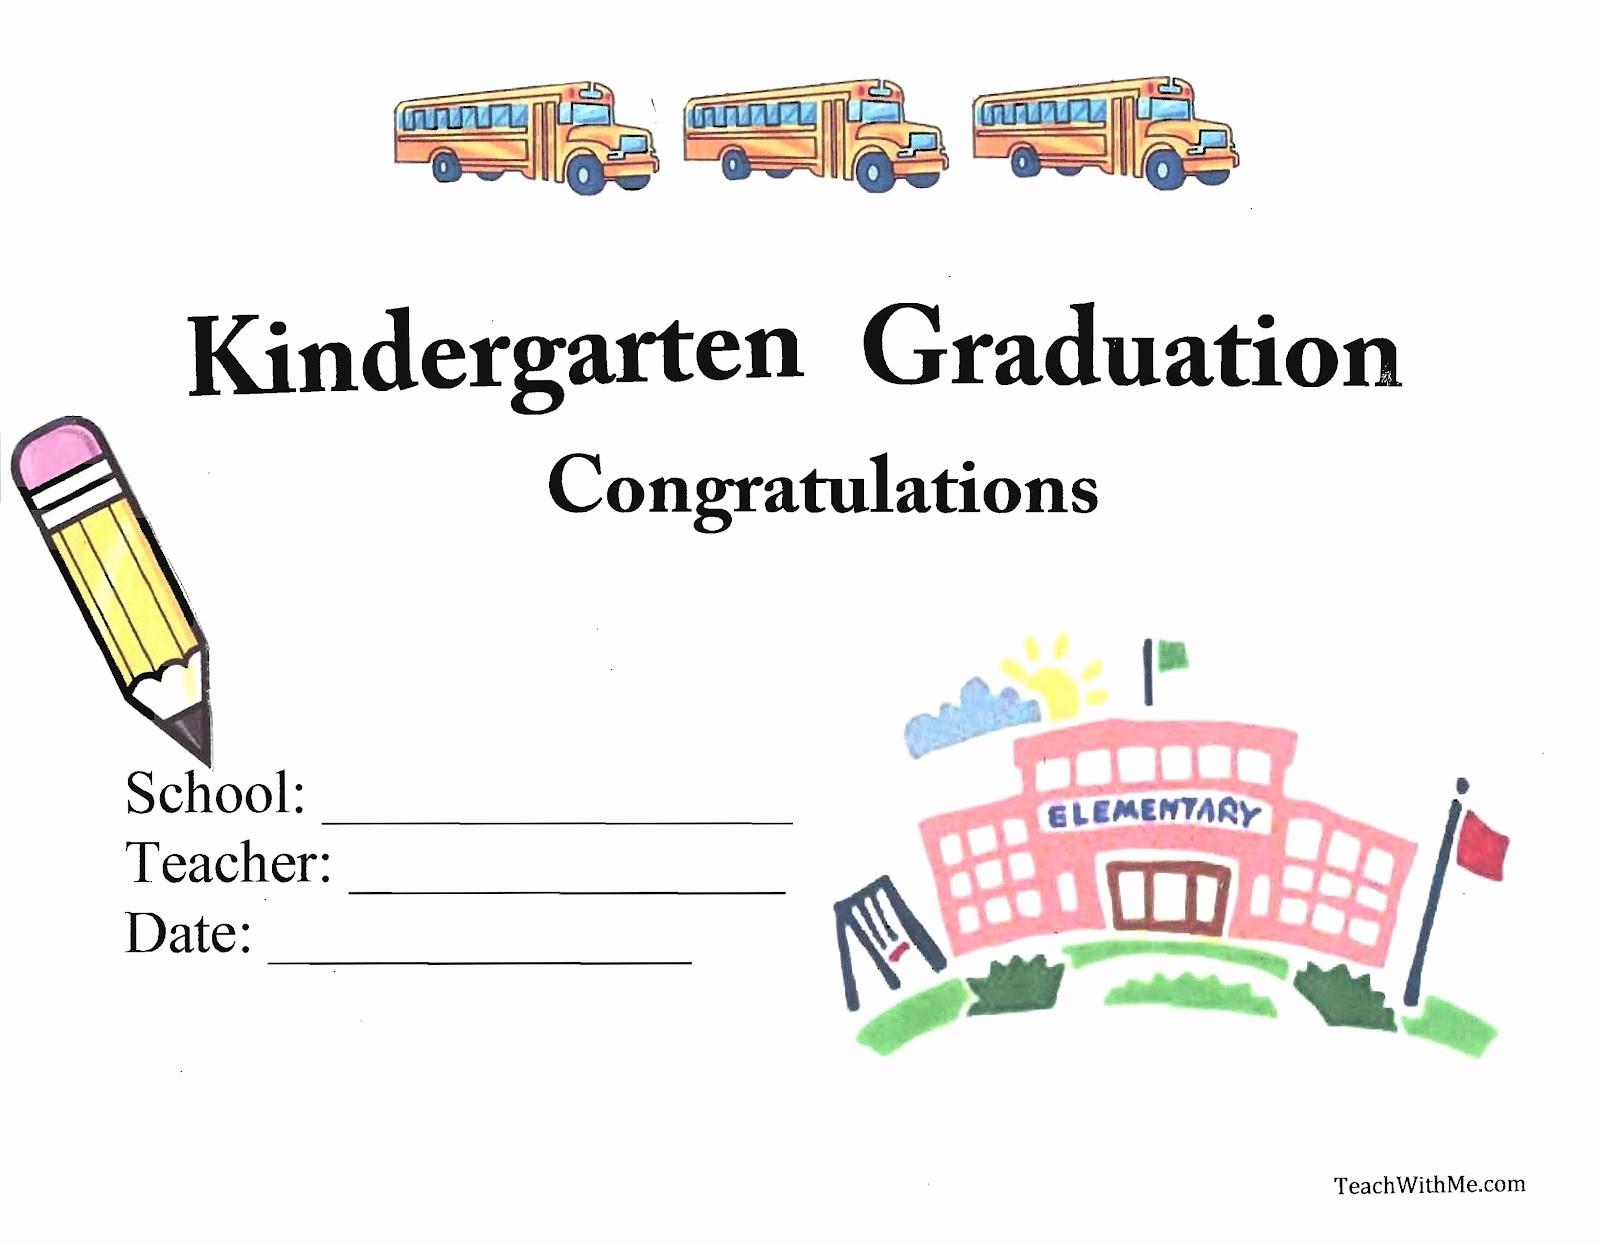 Kindergarten Graduation Diploma Free Printable Luxury Printable Kindergarten Graduation Template D Templates